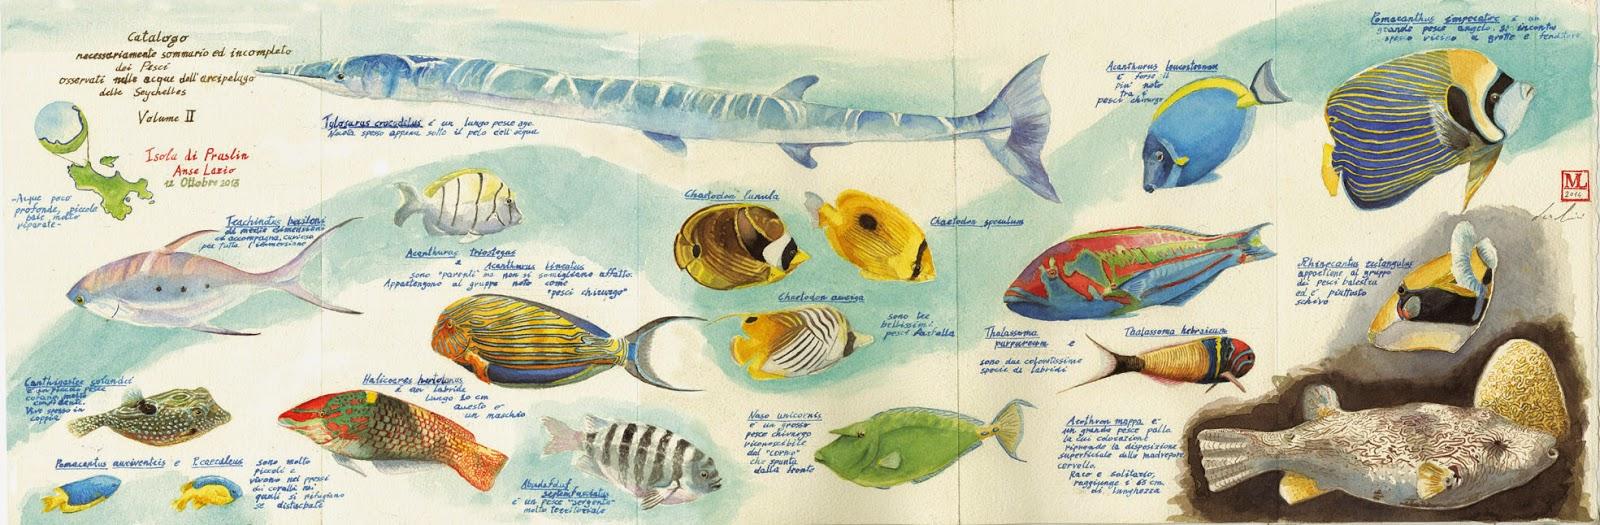 Ars et natura seychelles i pesci tropicali di luca marini - Pesci comuni in tavola ...